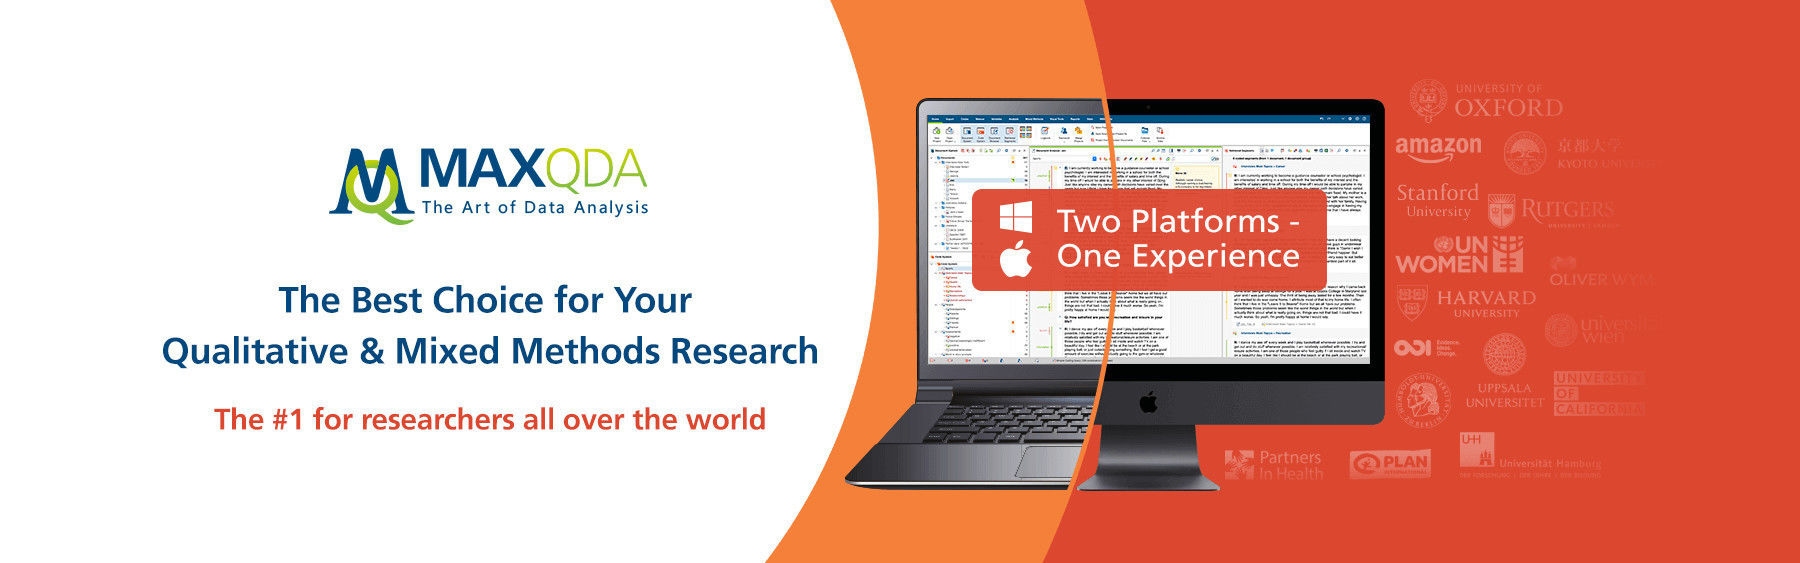 maxqda適用於雙平台